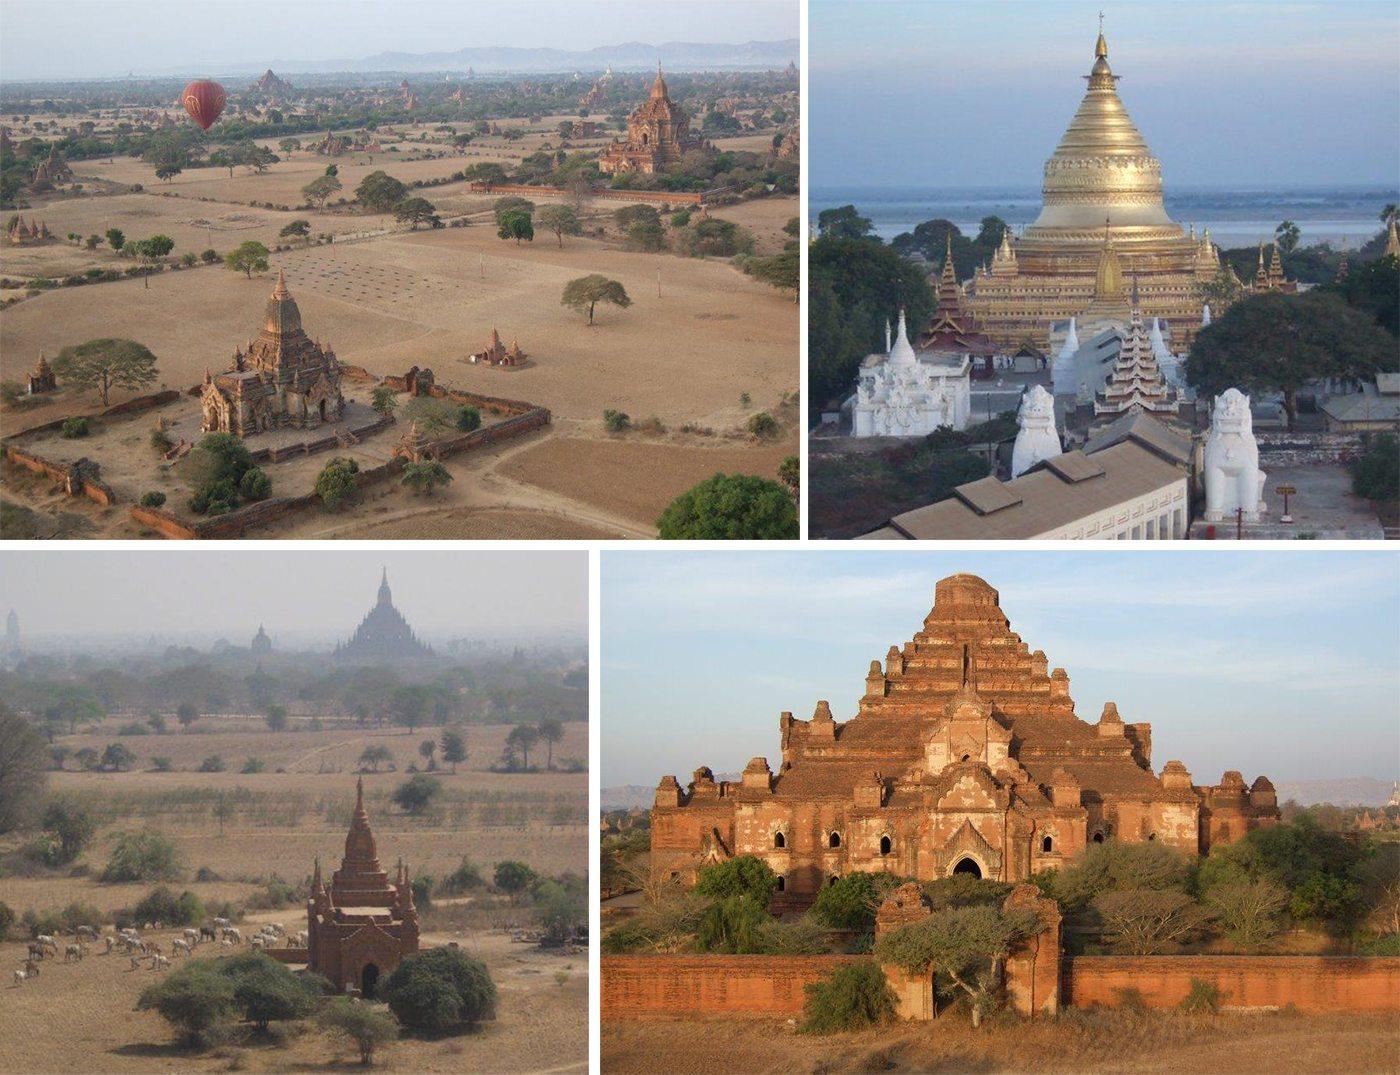 Bagan temple collage